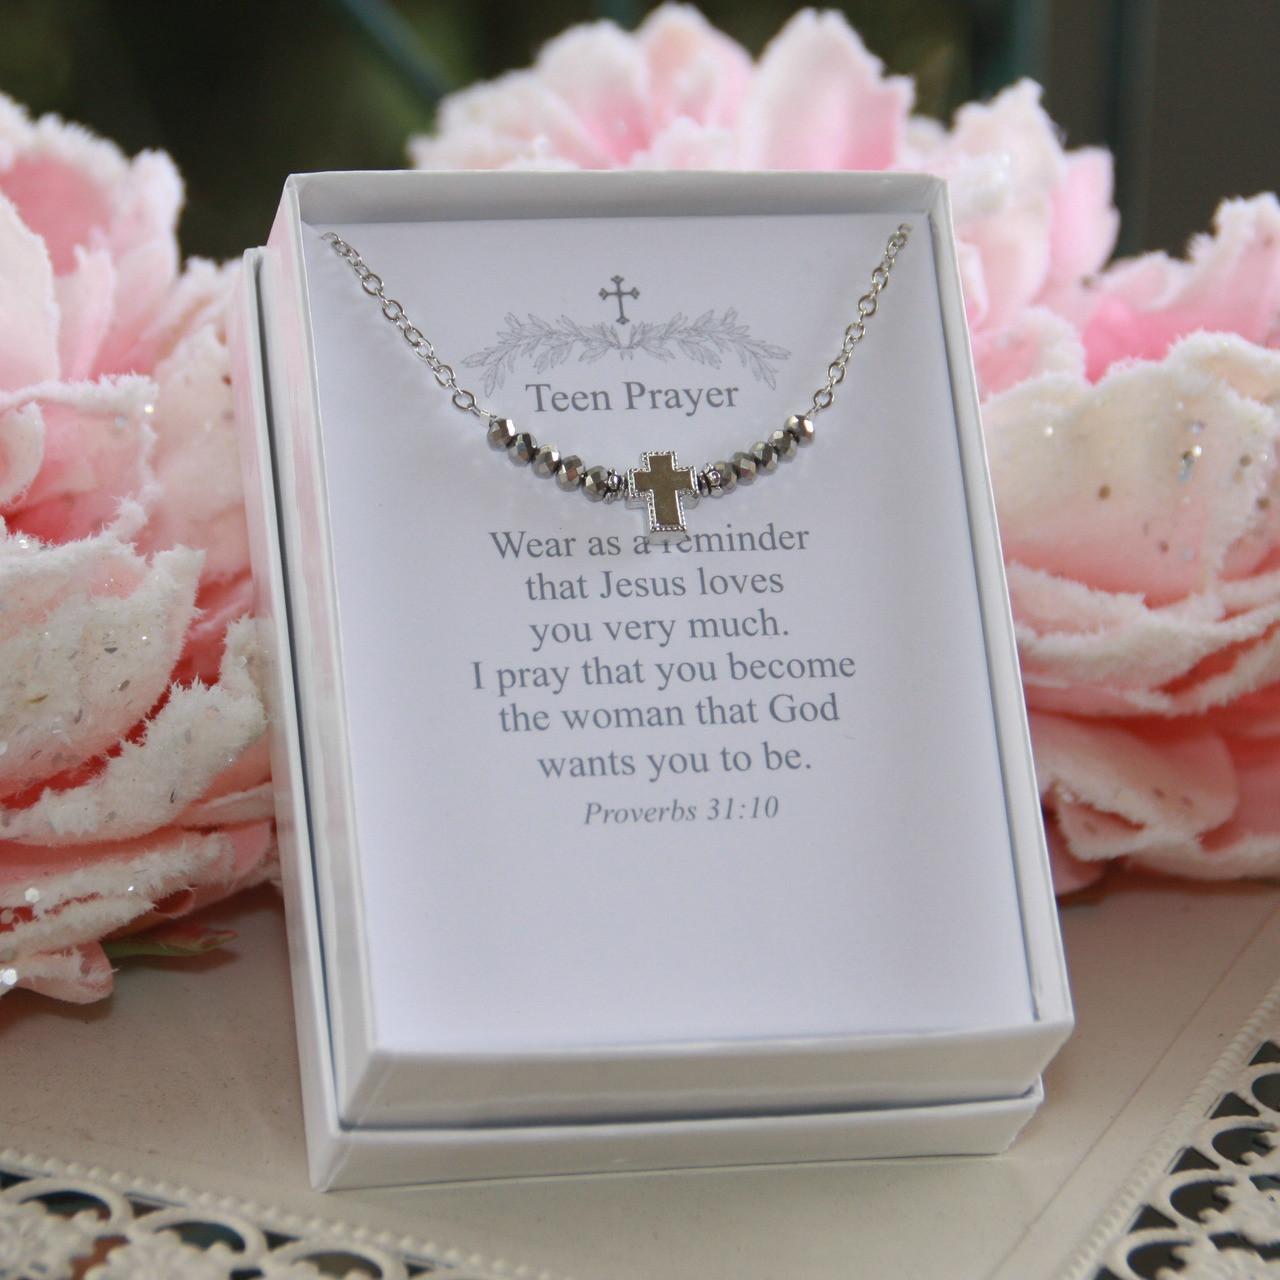 TN-11 Teen Prayer Necklace Silver Crystals